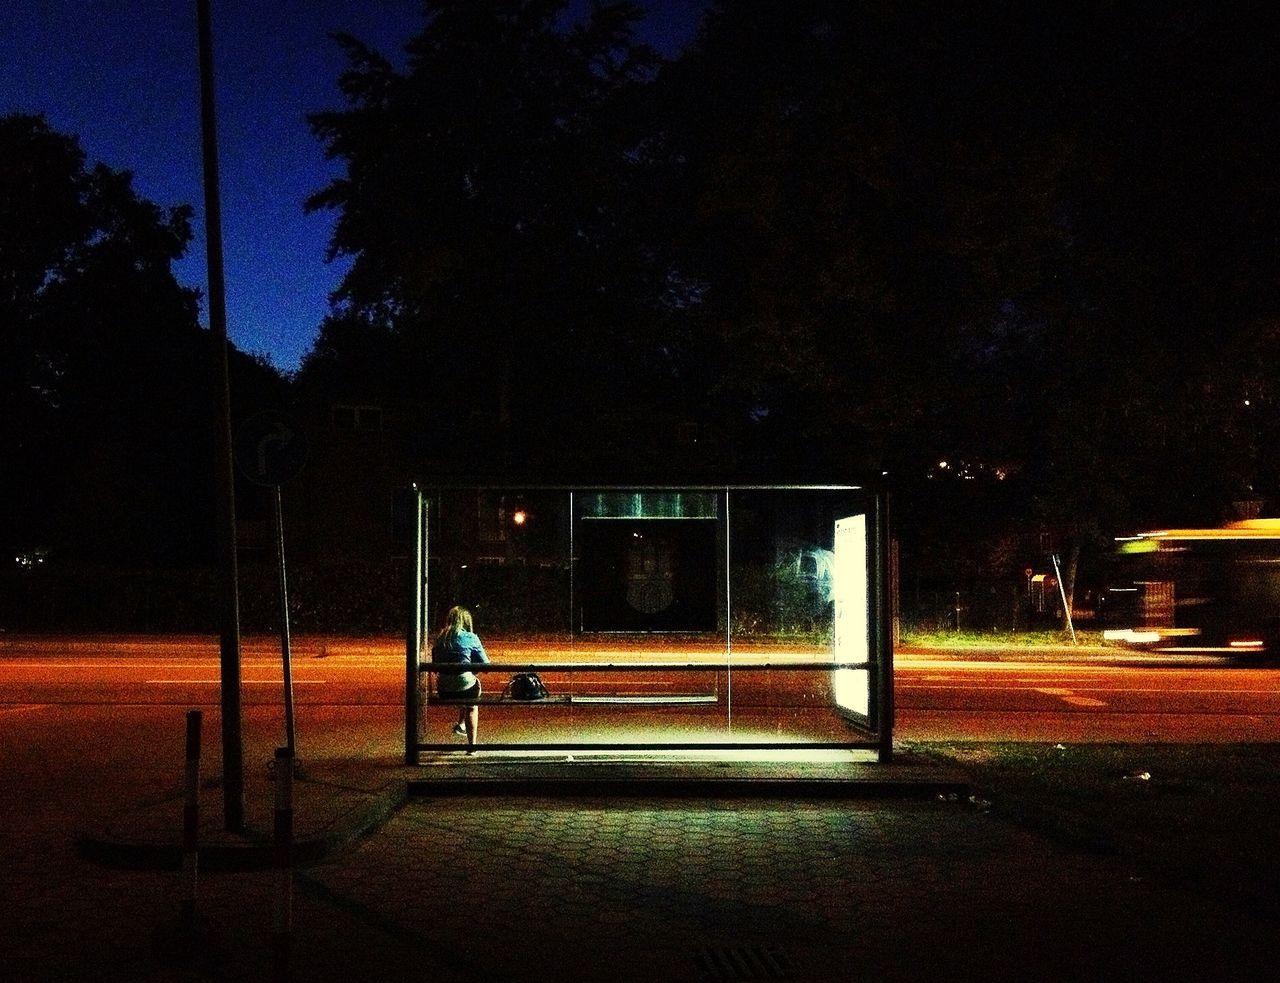 Waiting bus stop 25 Days of Summer Night Lights